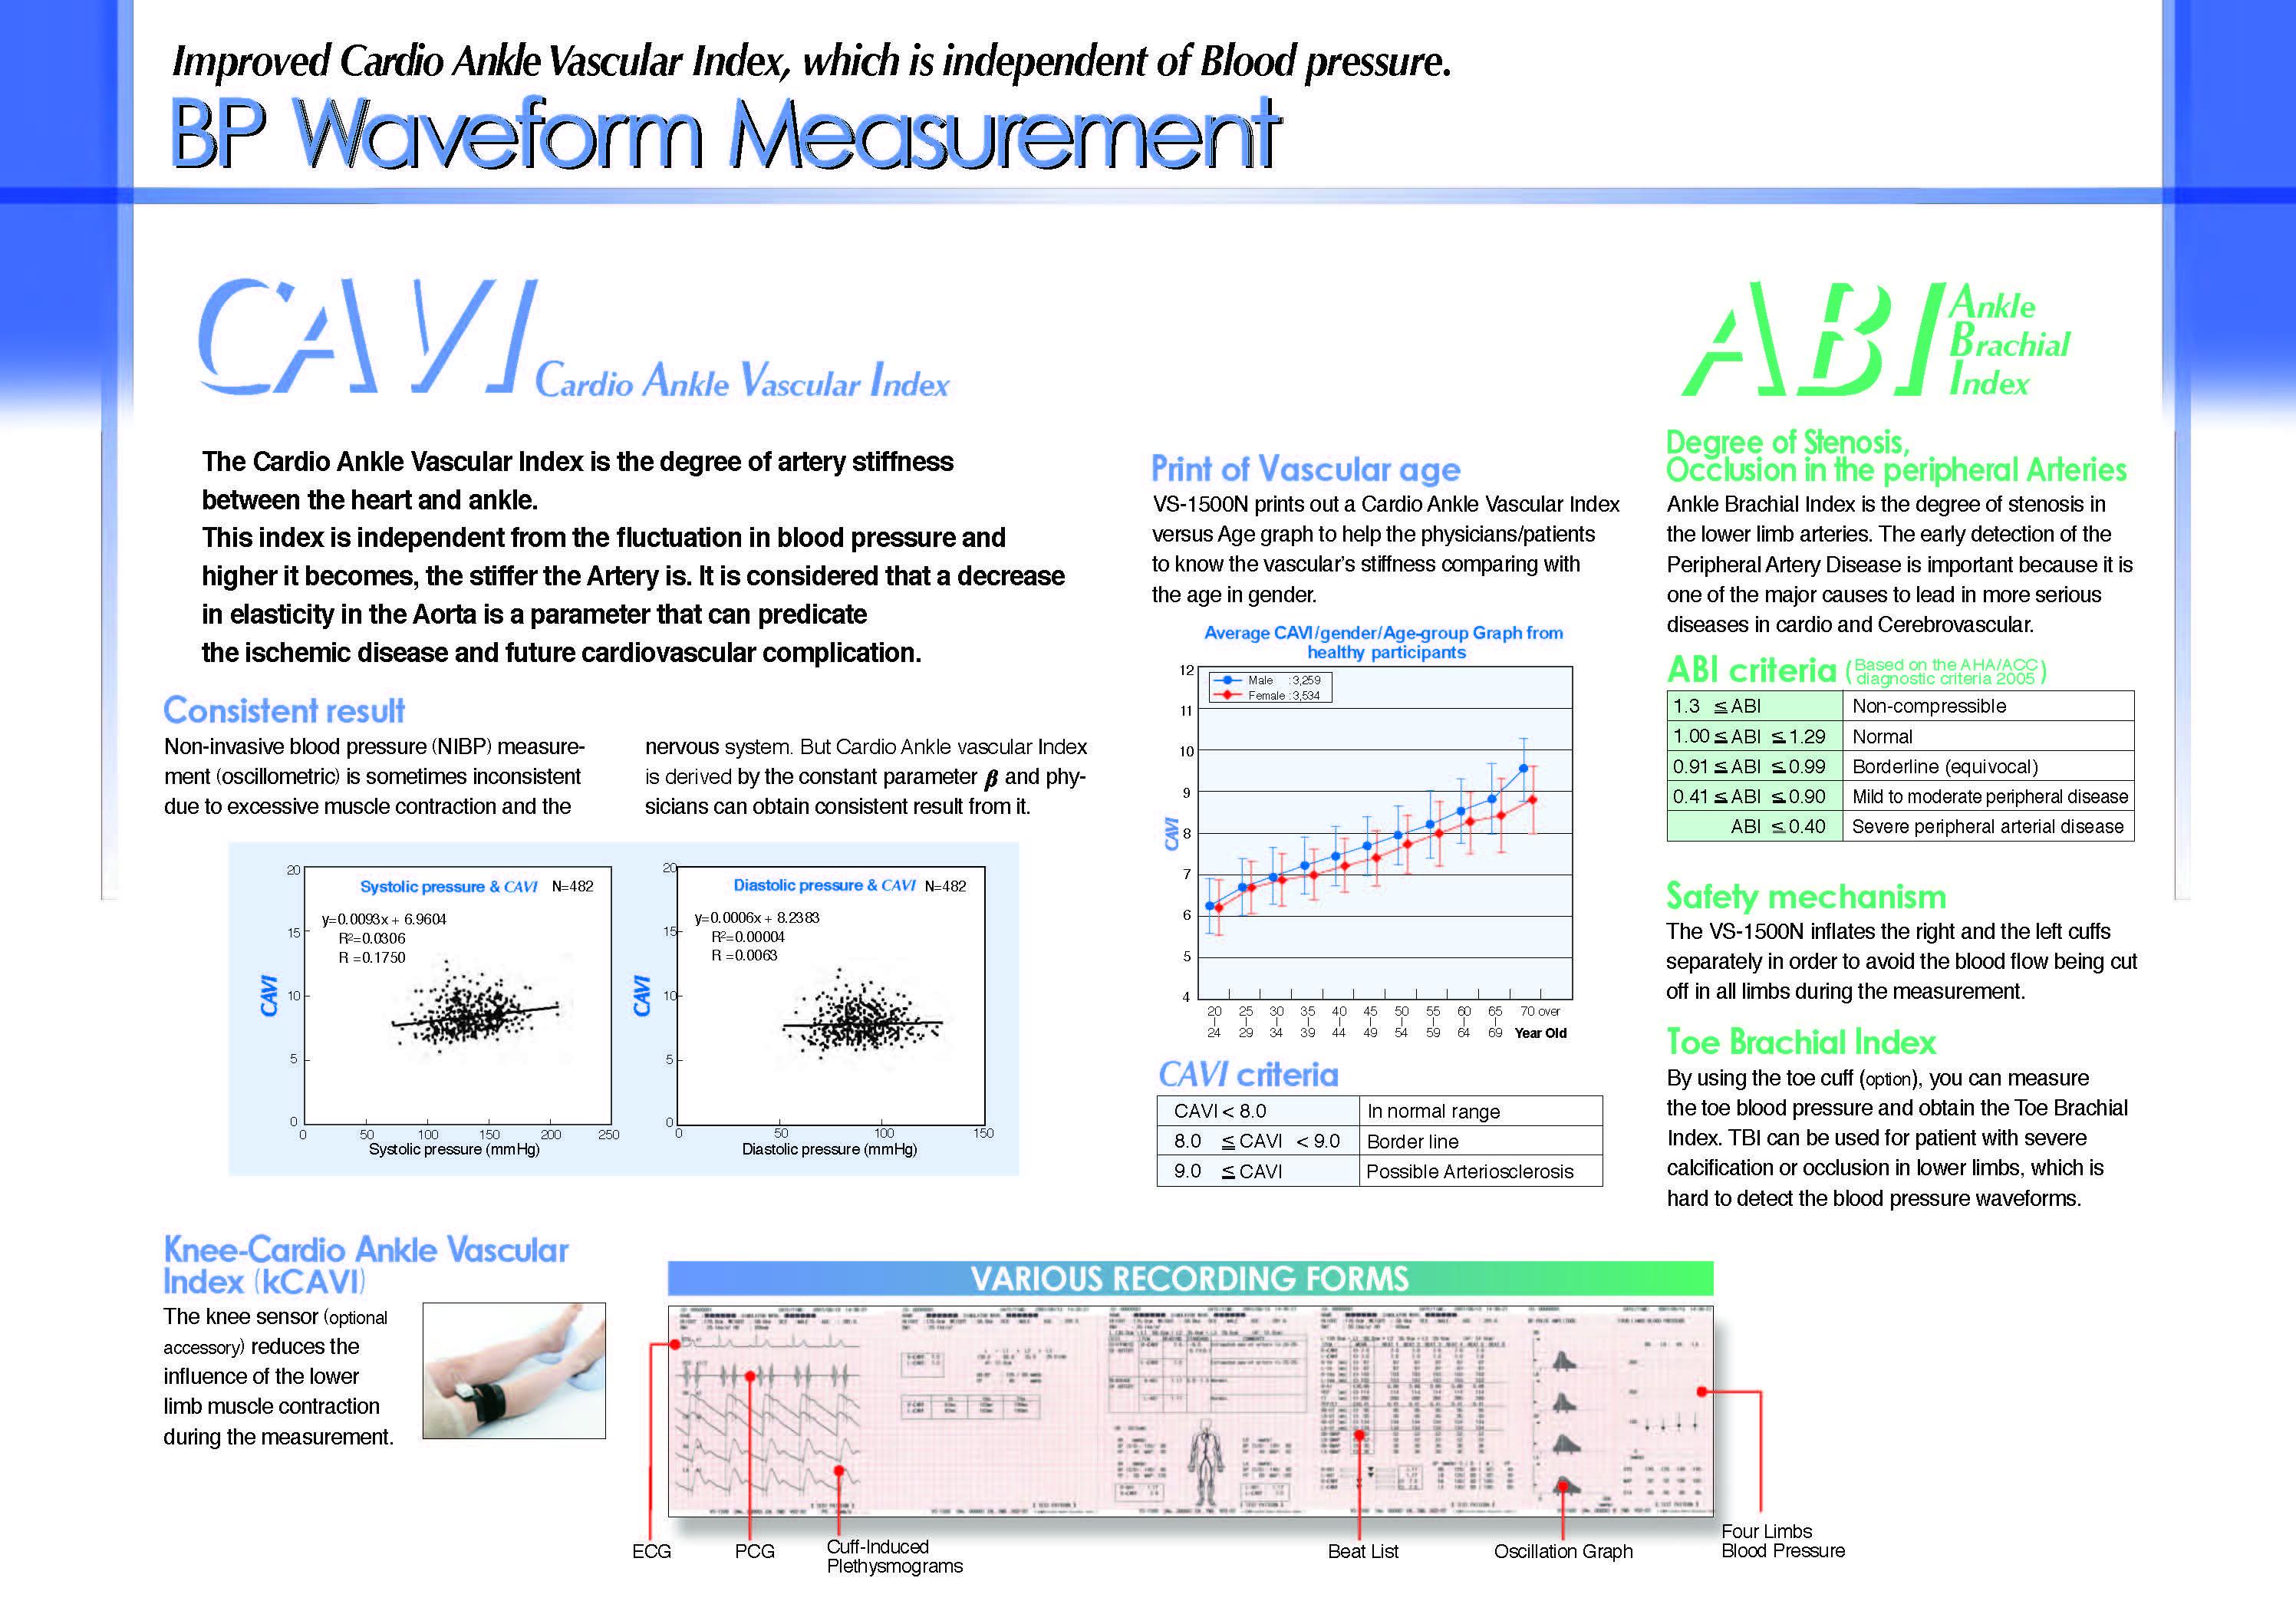 FukudaDenshi-VS1500 - Physiological Monitors - Products - The